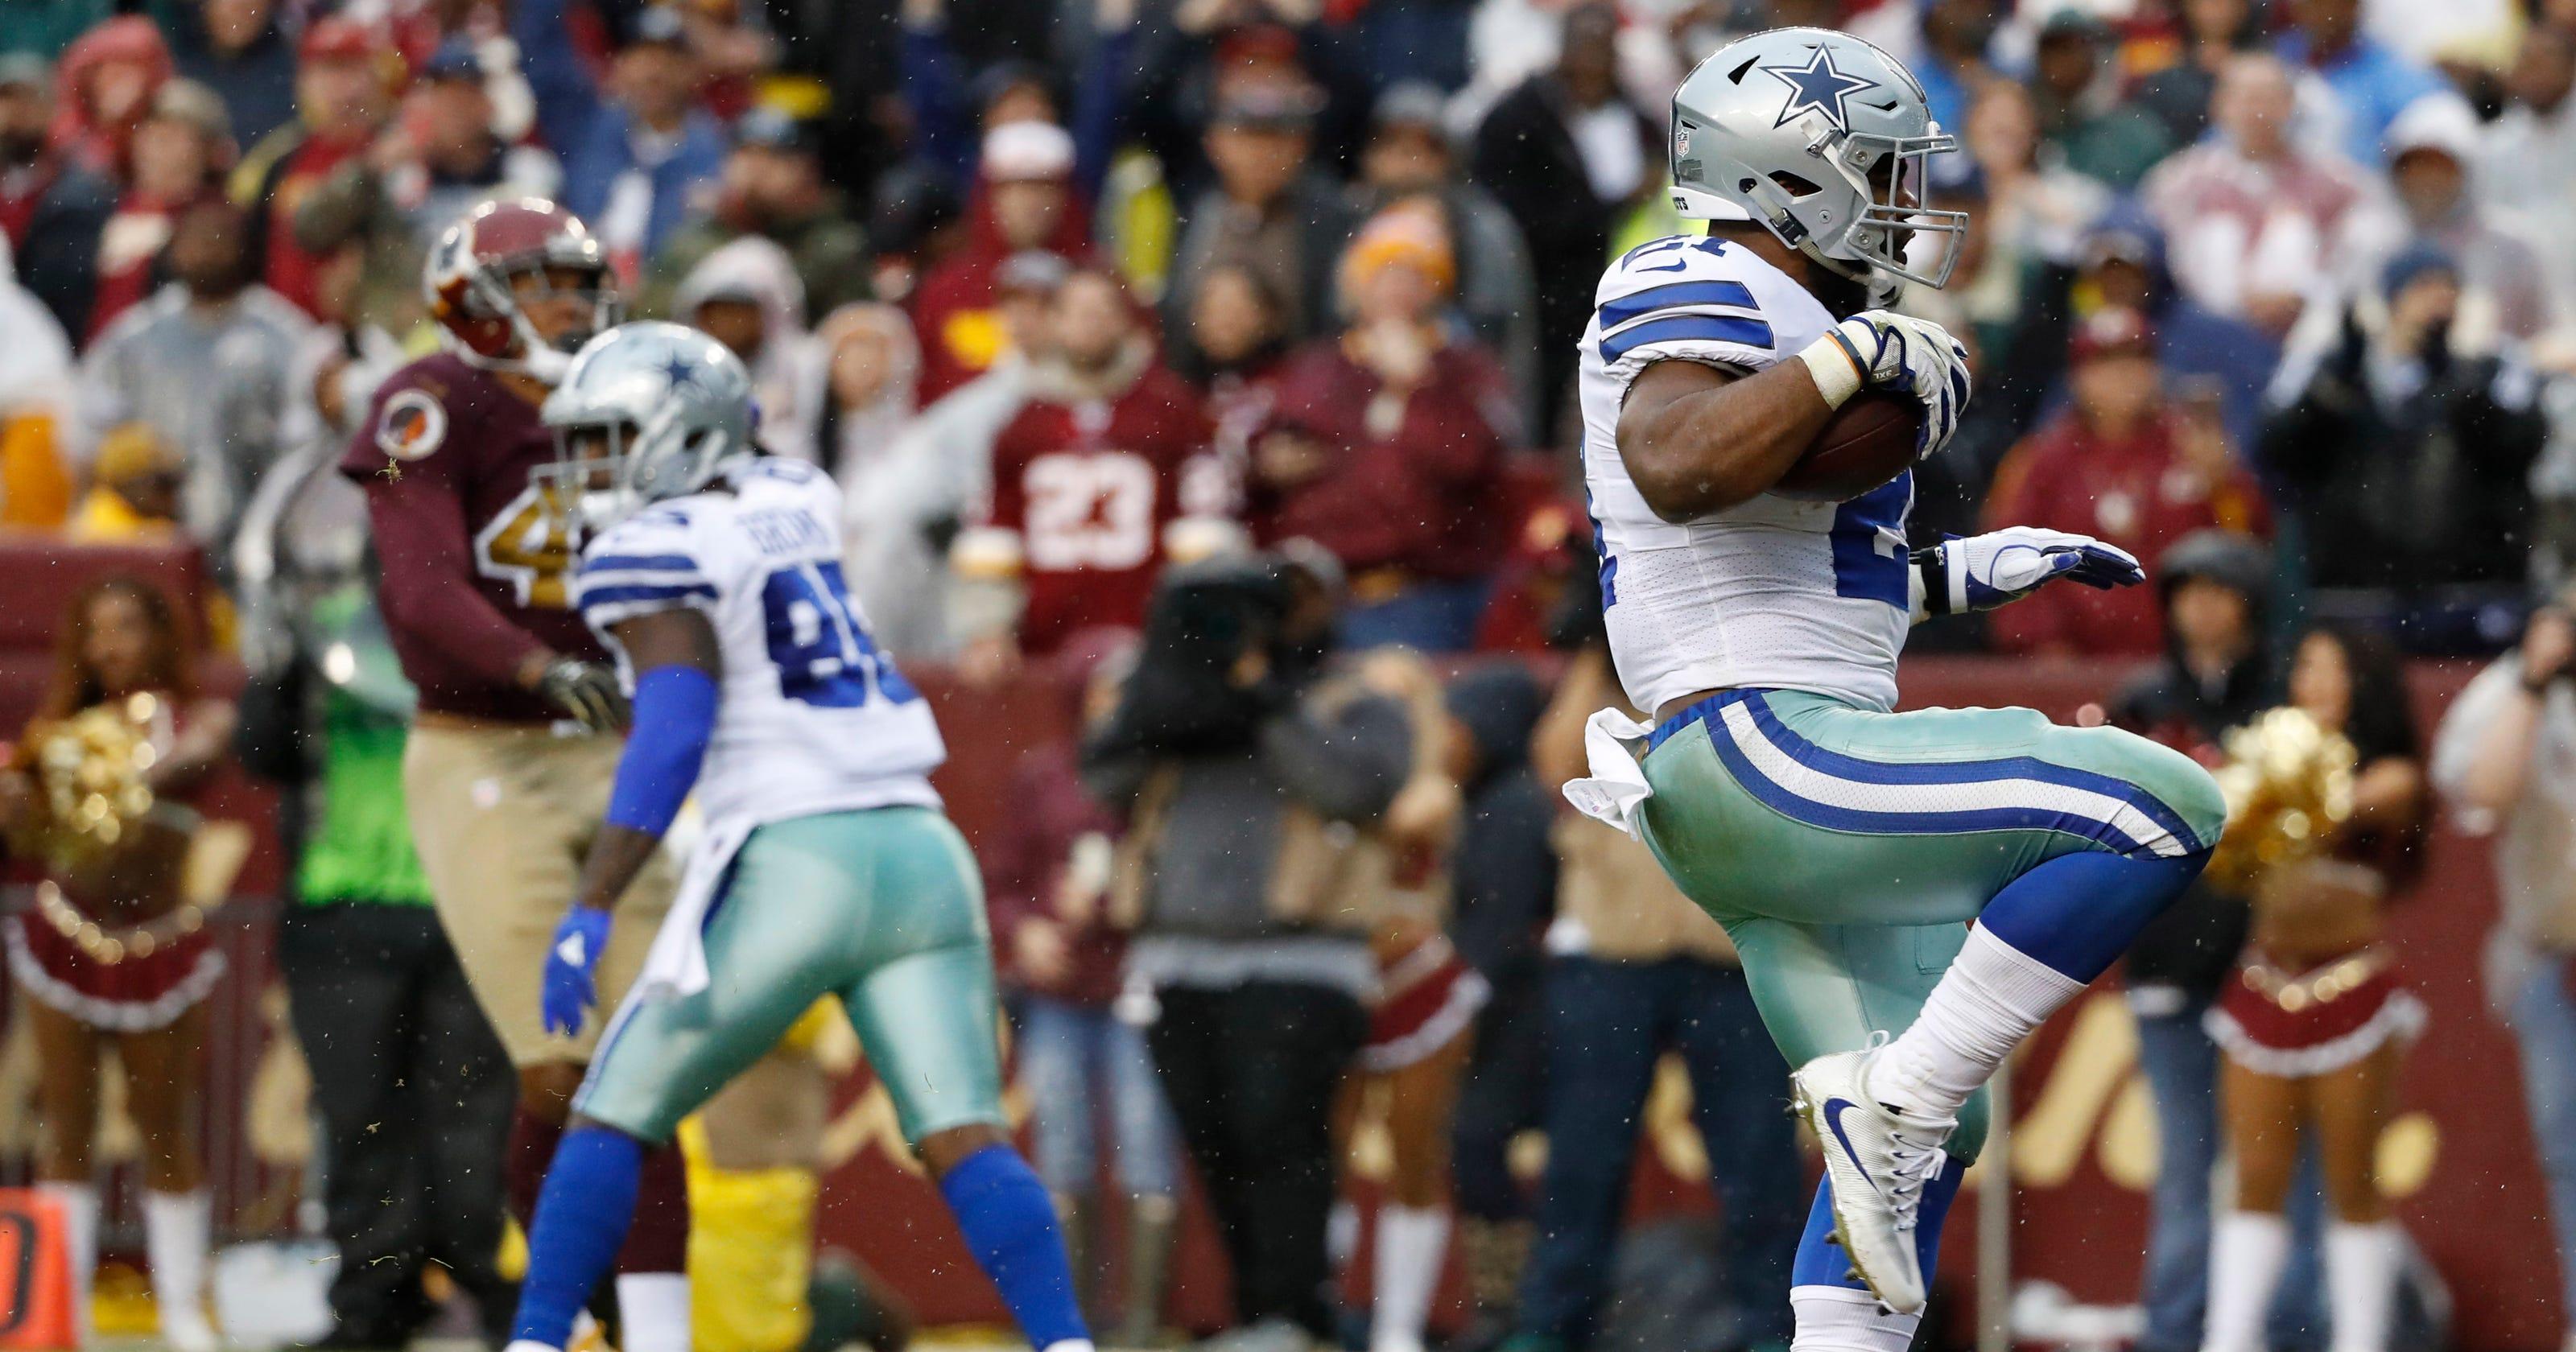 ee2f72d3951 Ezekiel Elliott carries Cowboys past Redskins as legal drama looms. Nancy  Armour